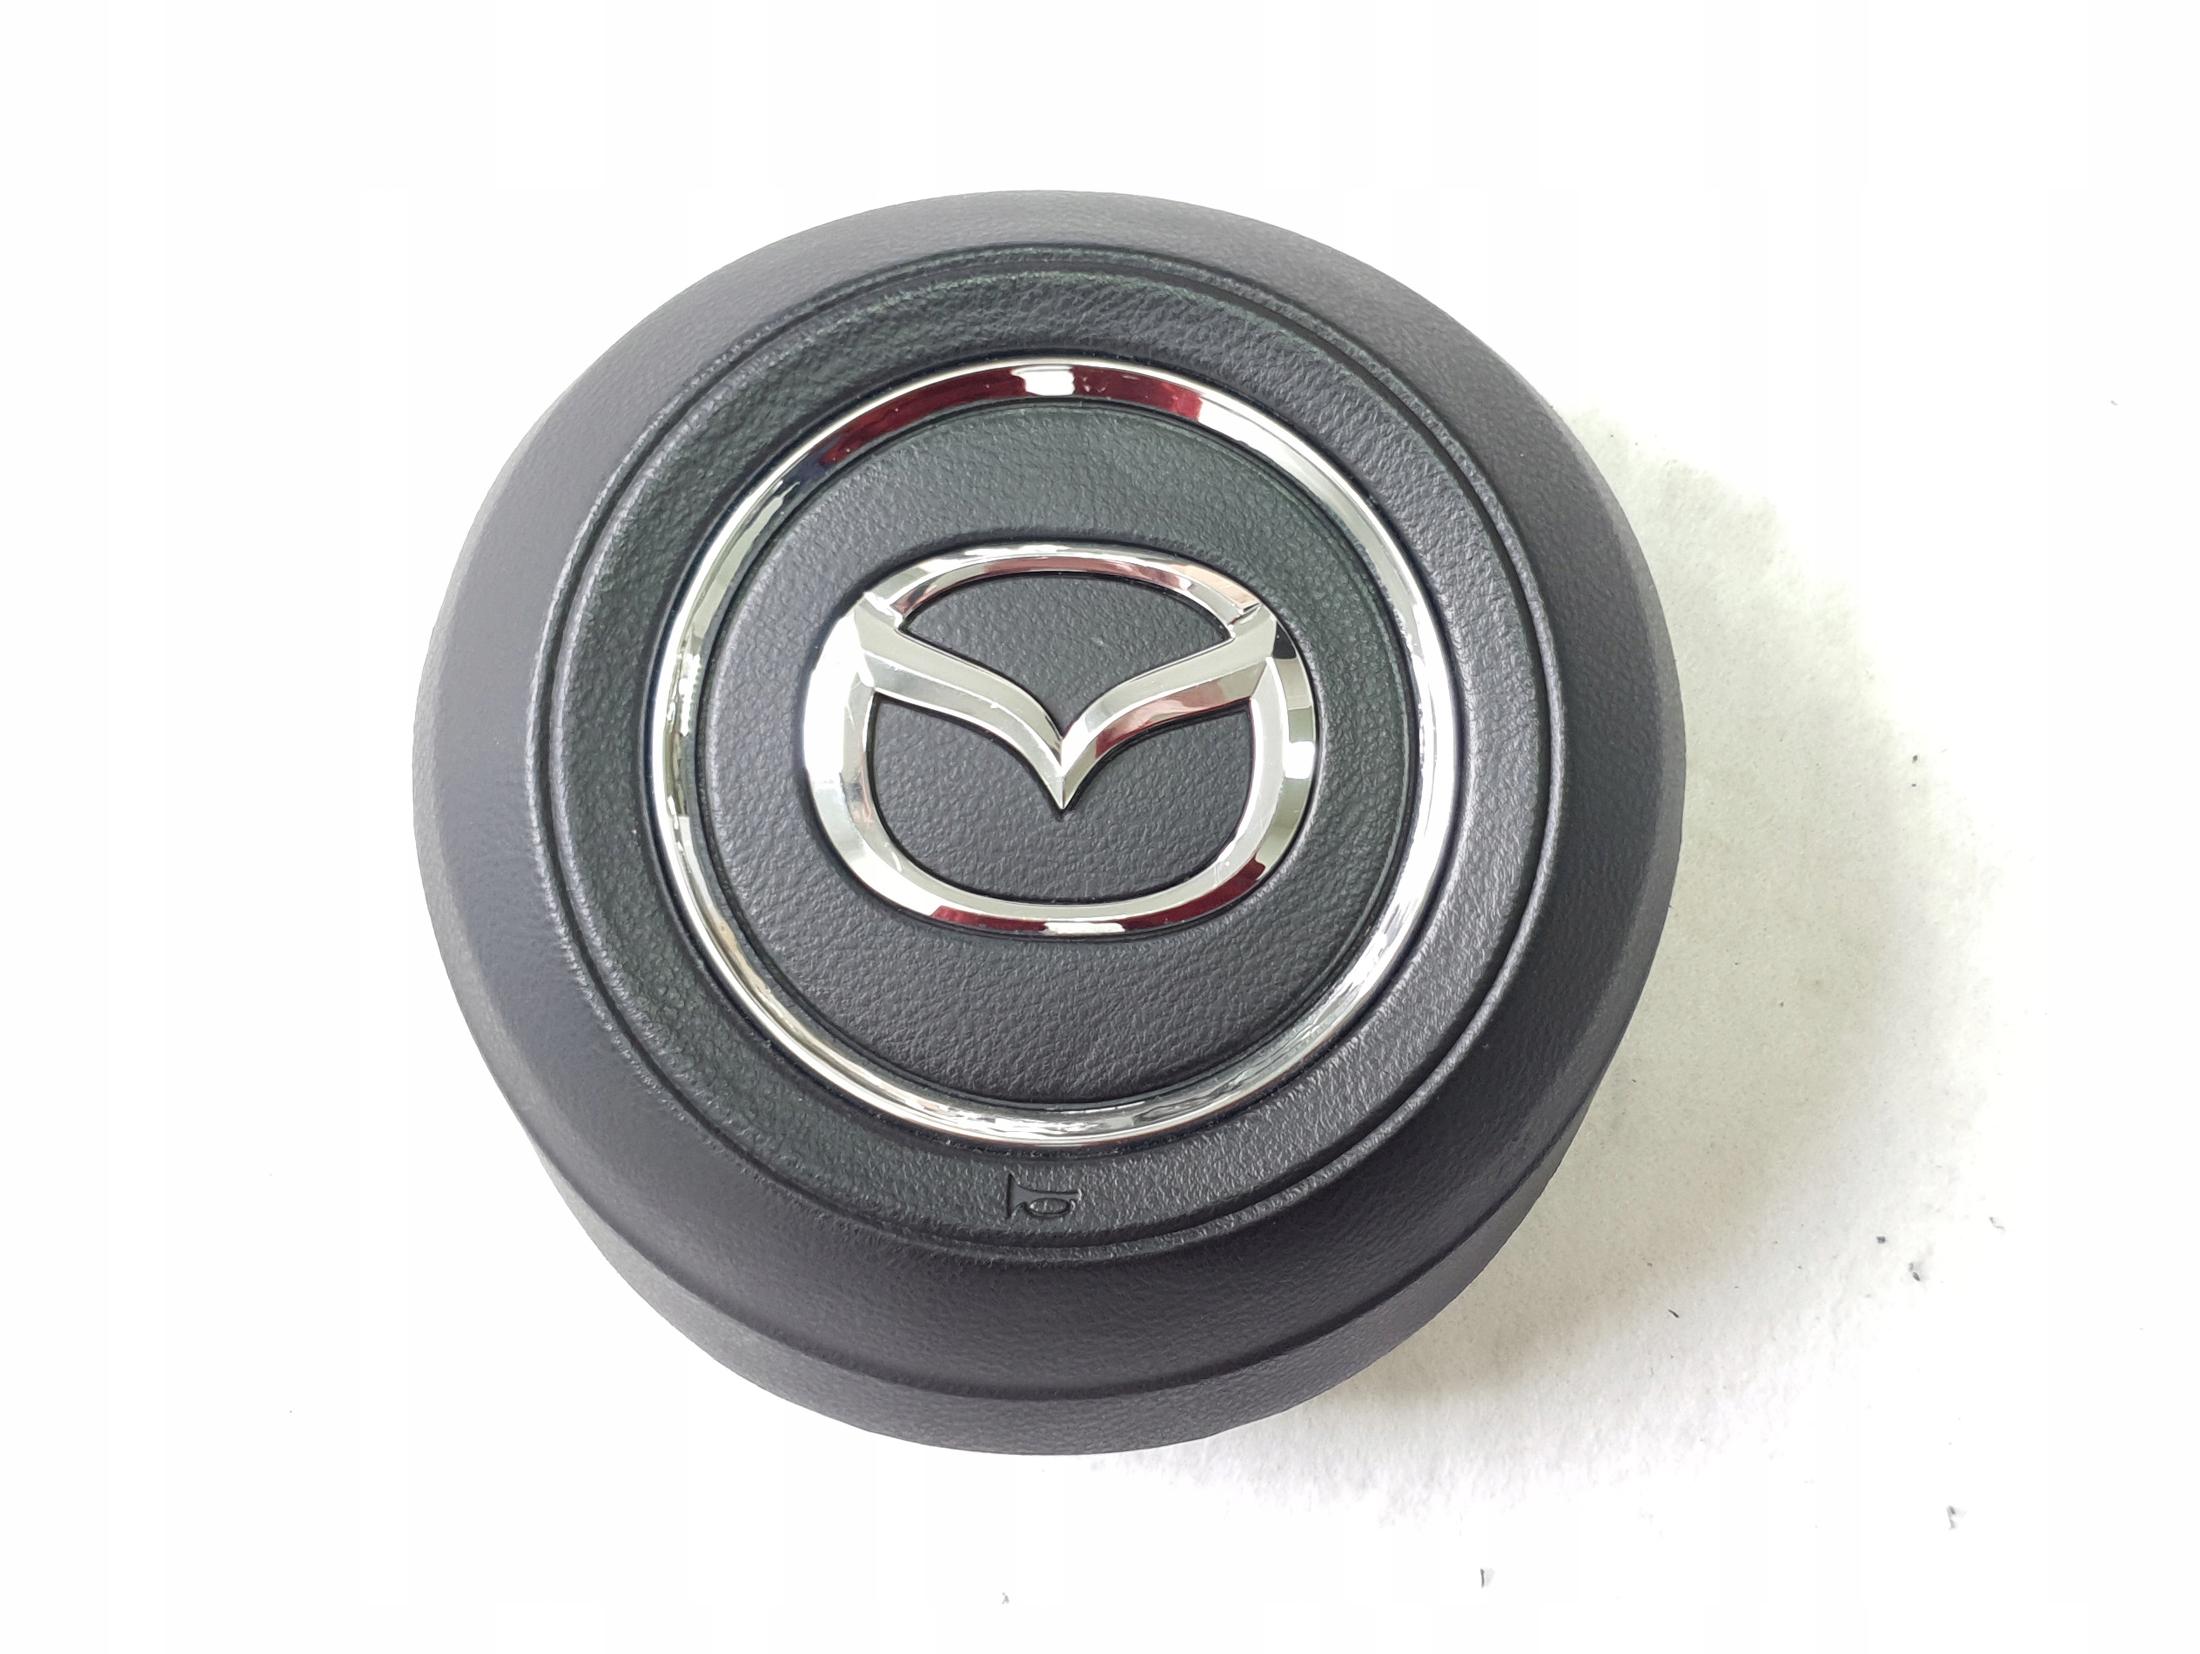 Airbag Poduszka Mazda Cx 9 Cx 9 Cx9 Eu Usa Reg Ori Lusowo Allegro Pl